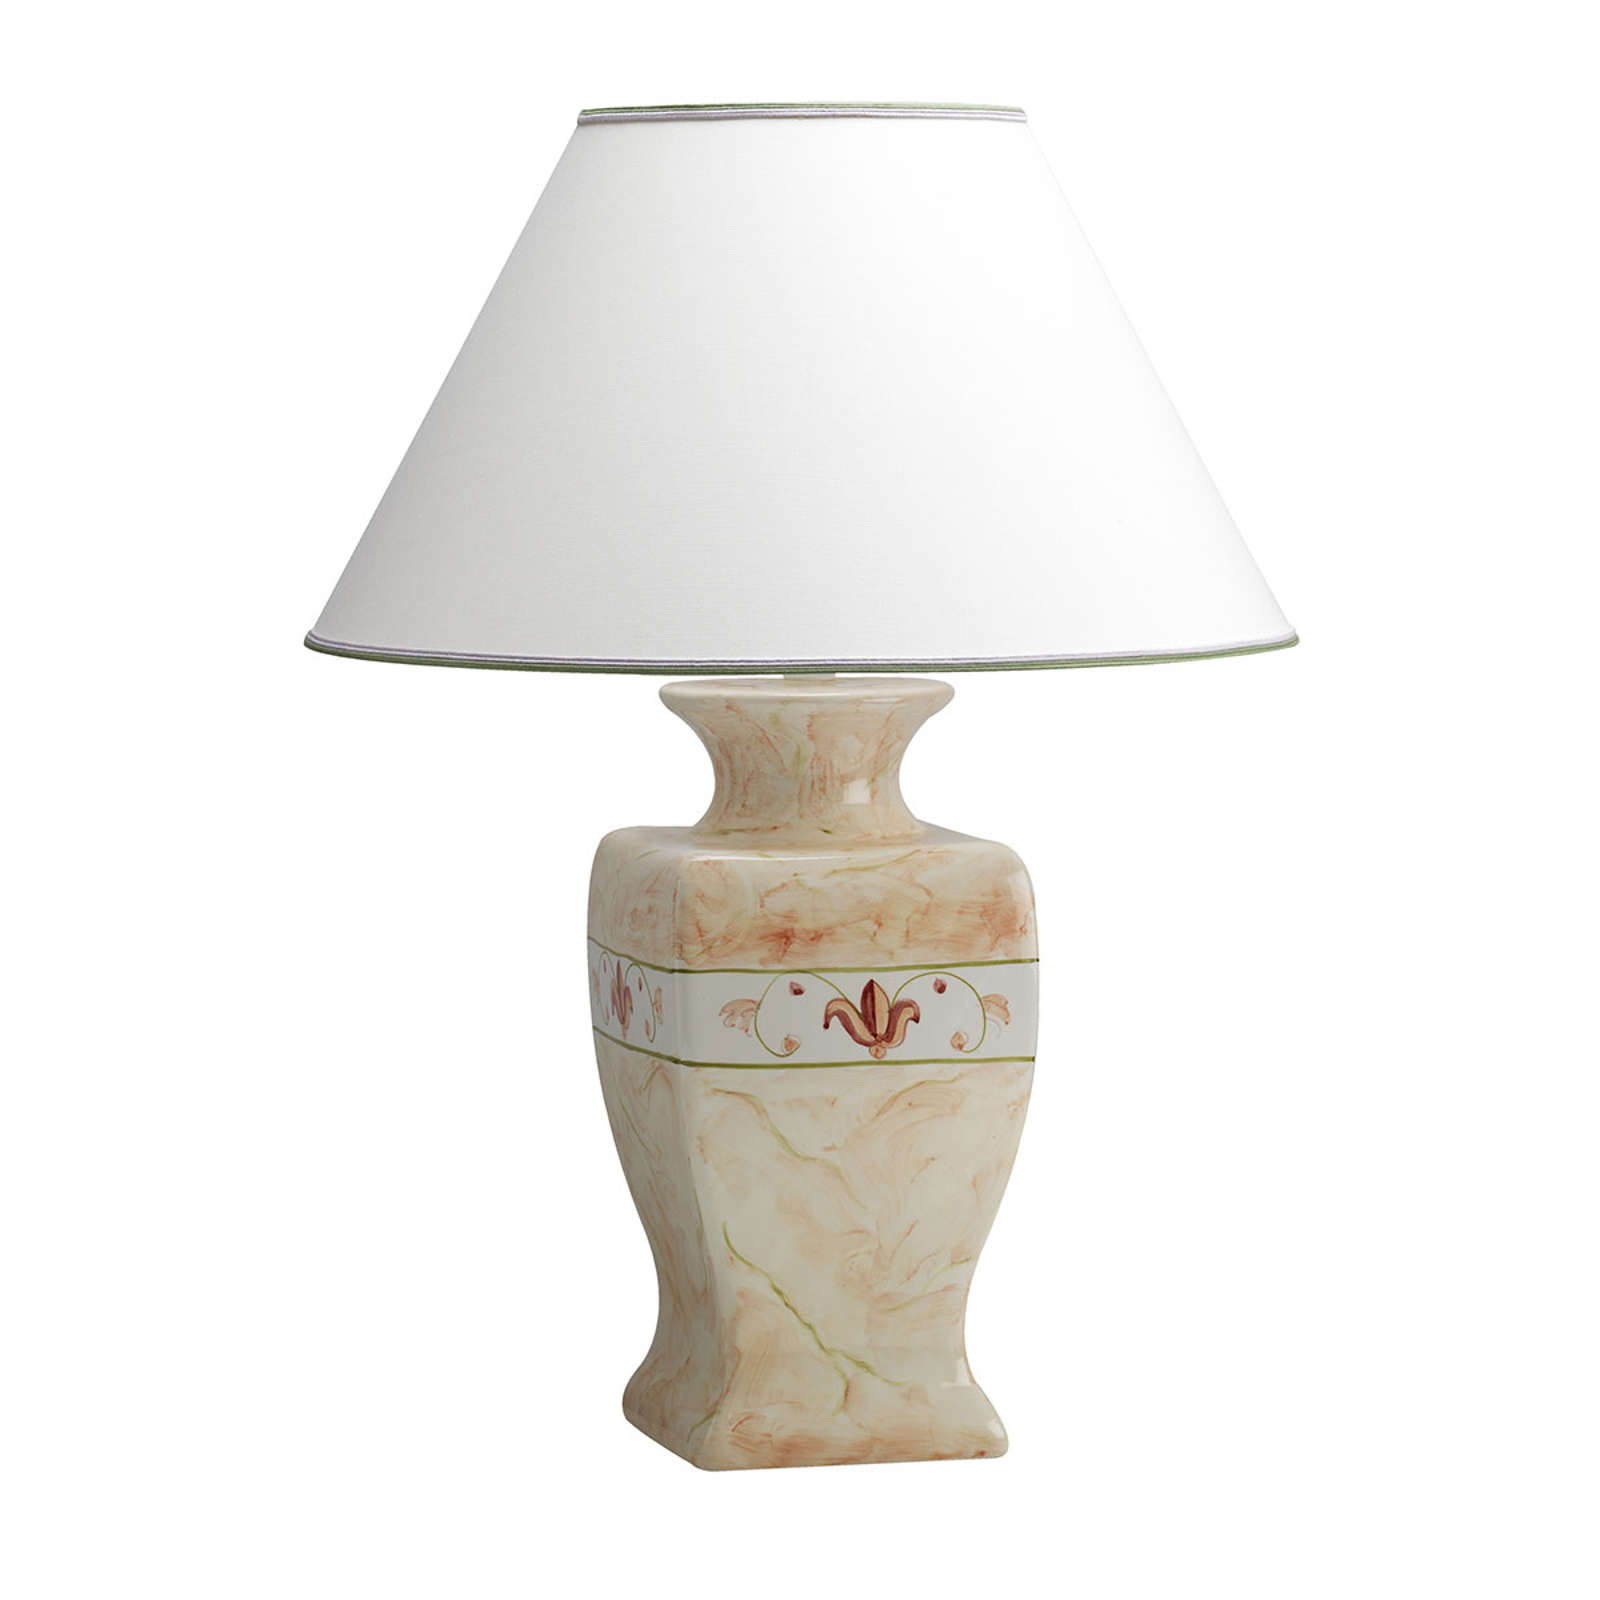 Taburetlampe i keramik Marmorino, 70 cm